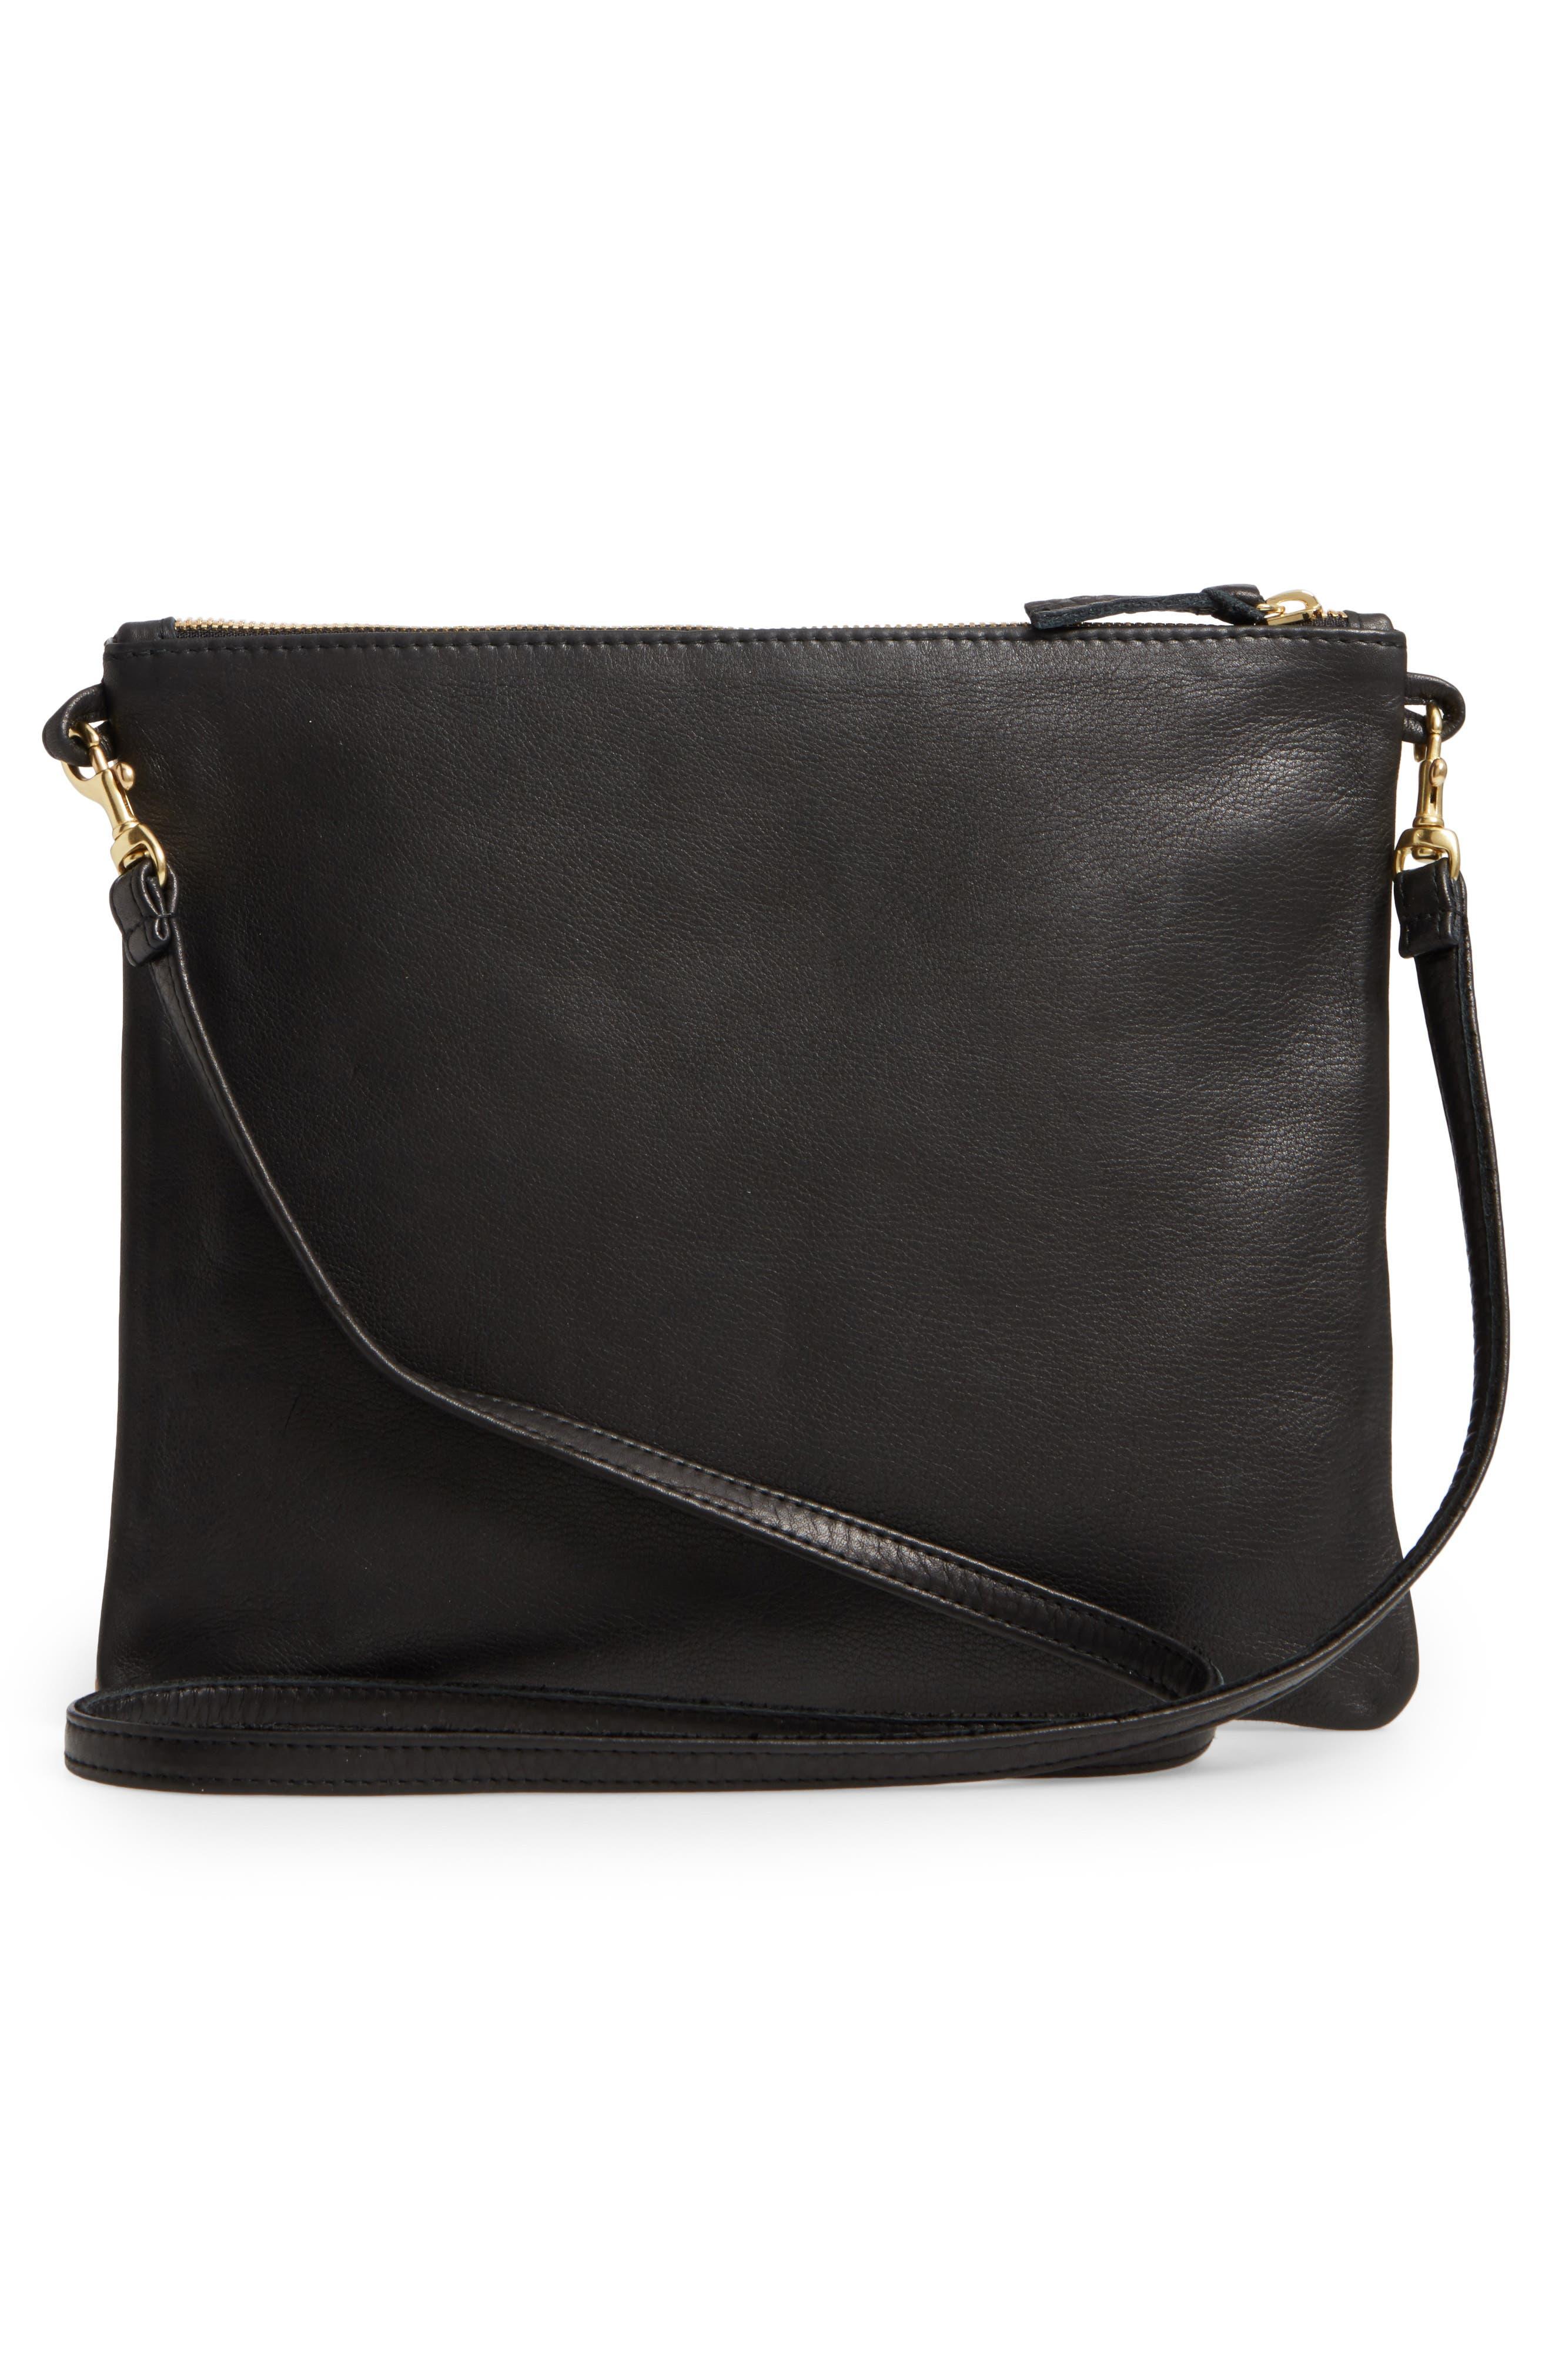 70c96f7df913 Clare V. Handbags   Wallets for Women